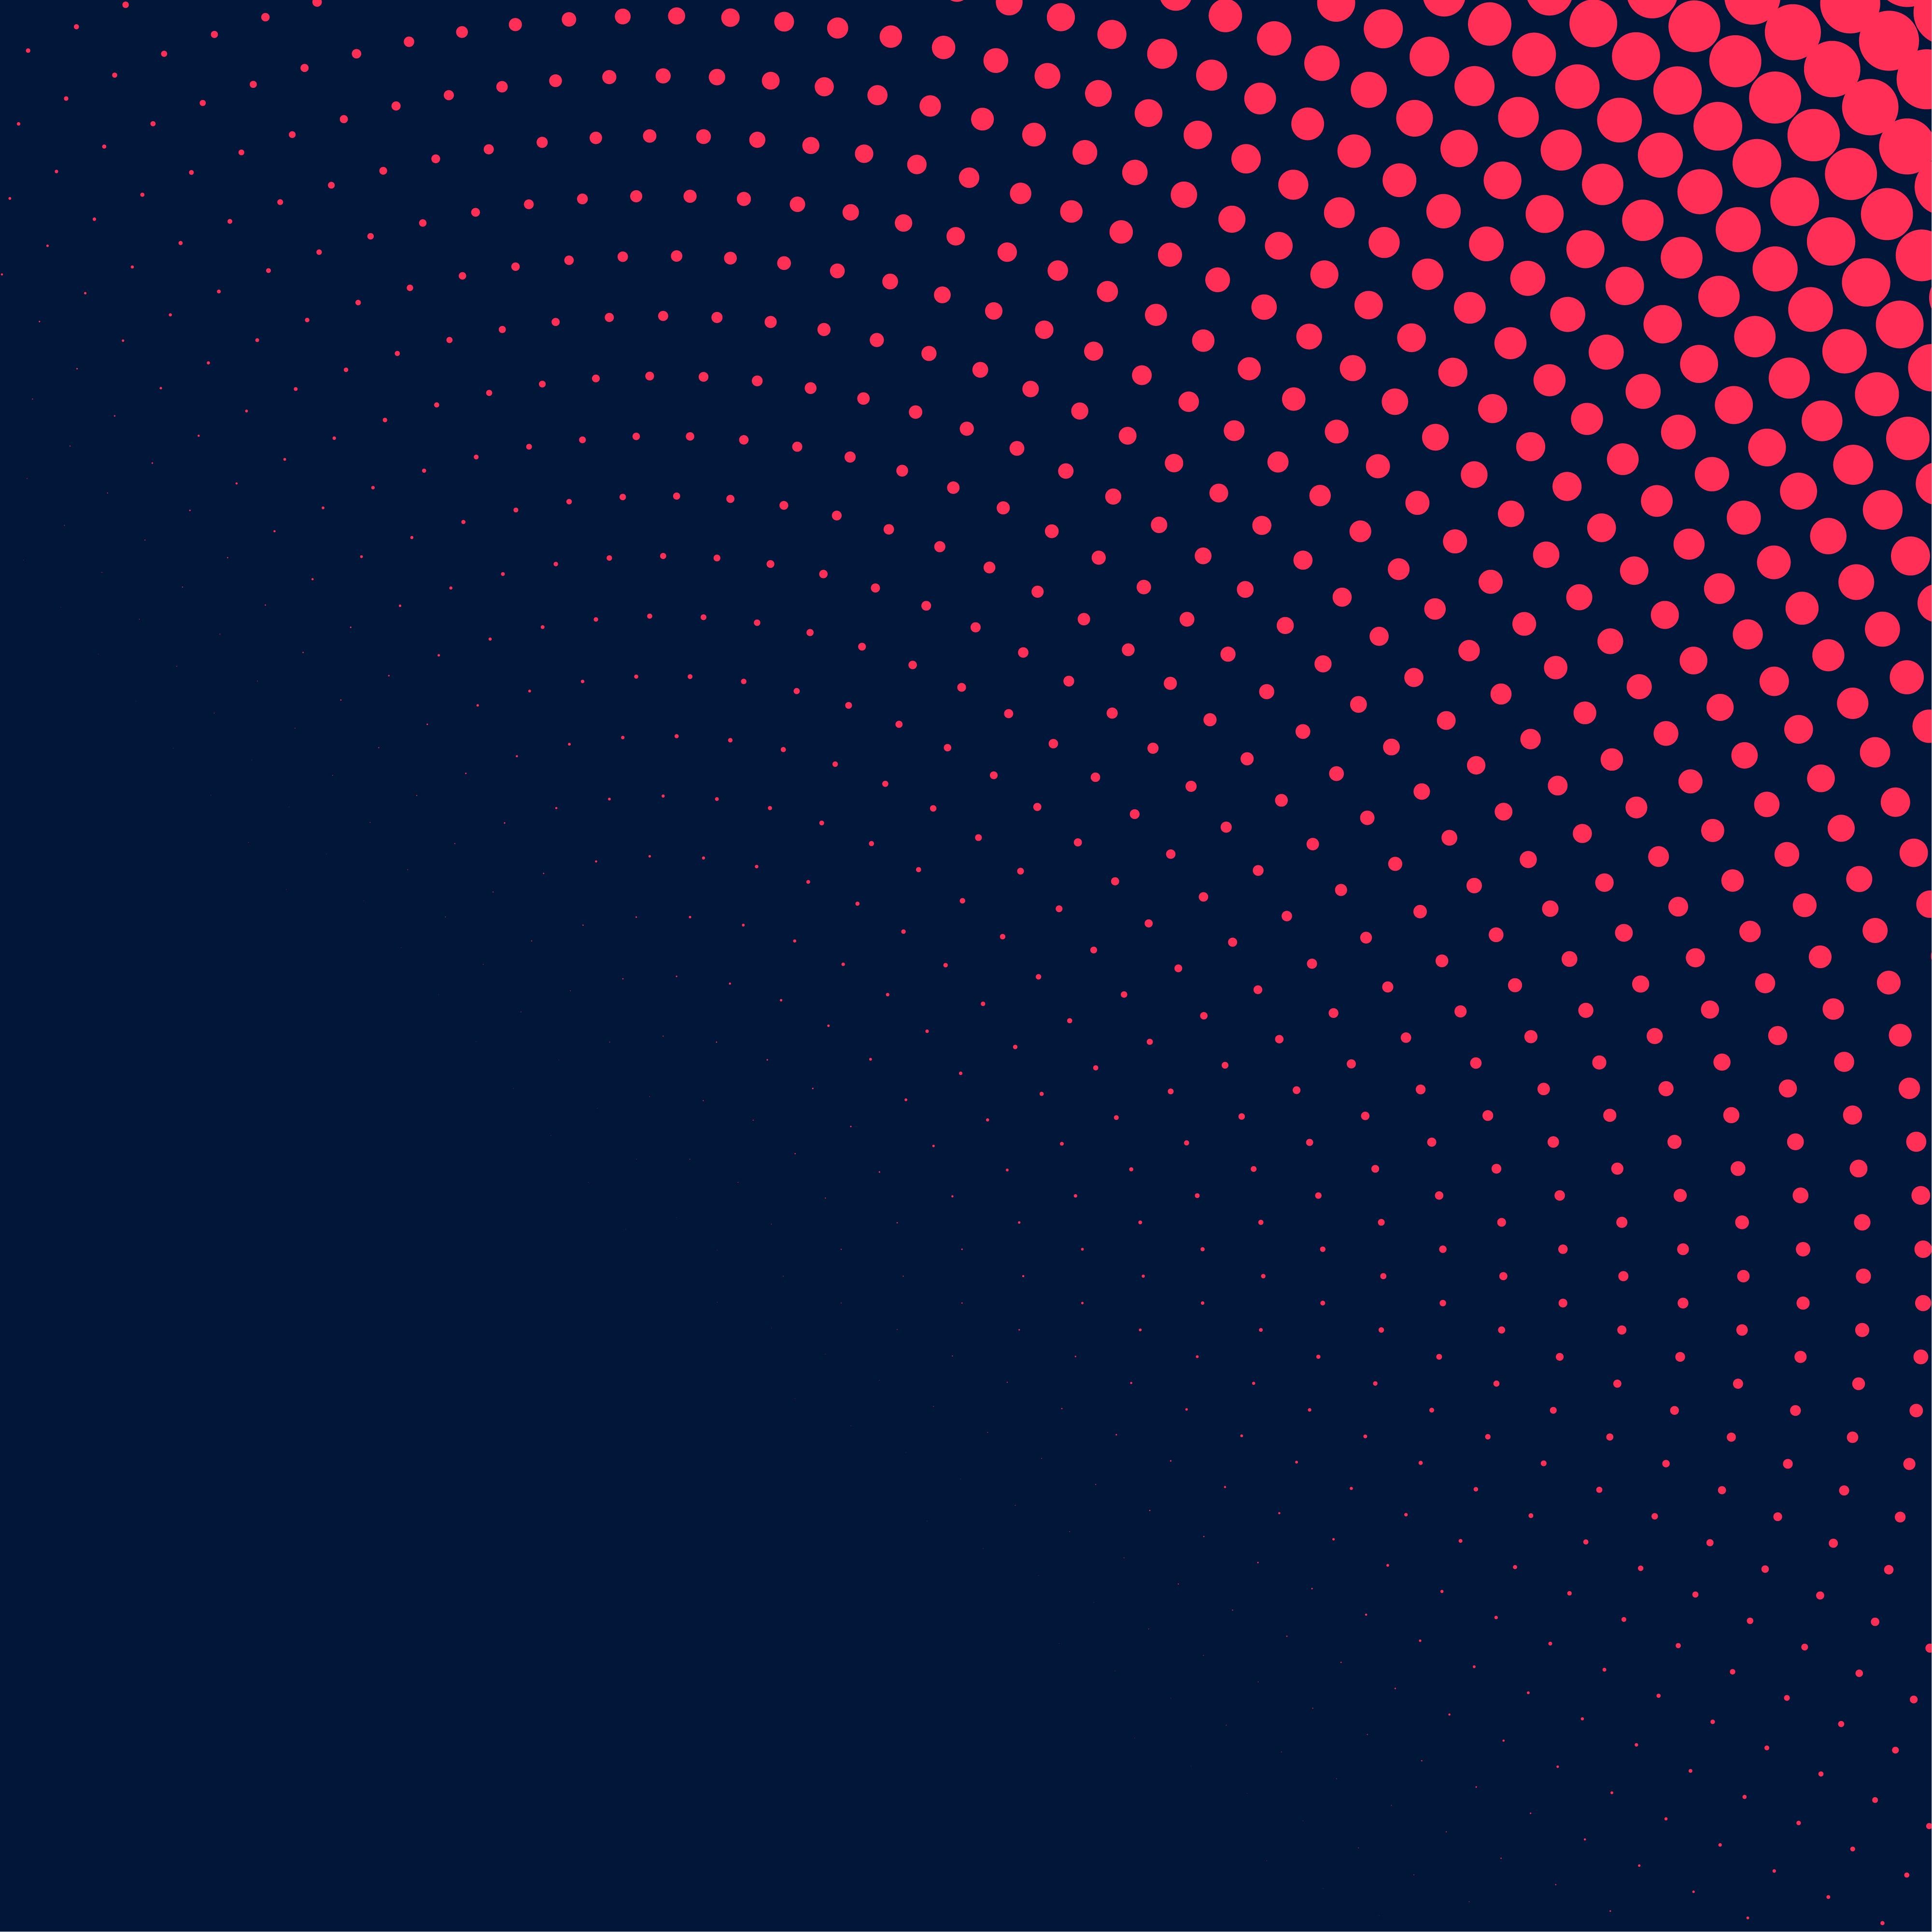 abstract dark halftone background design - Download Free ... - photo #17